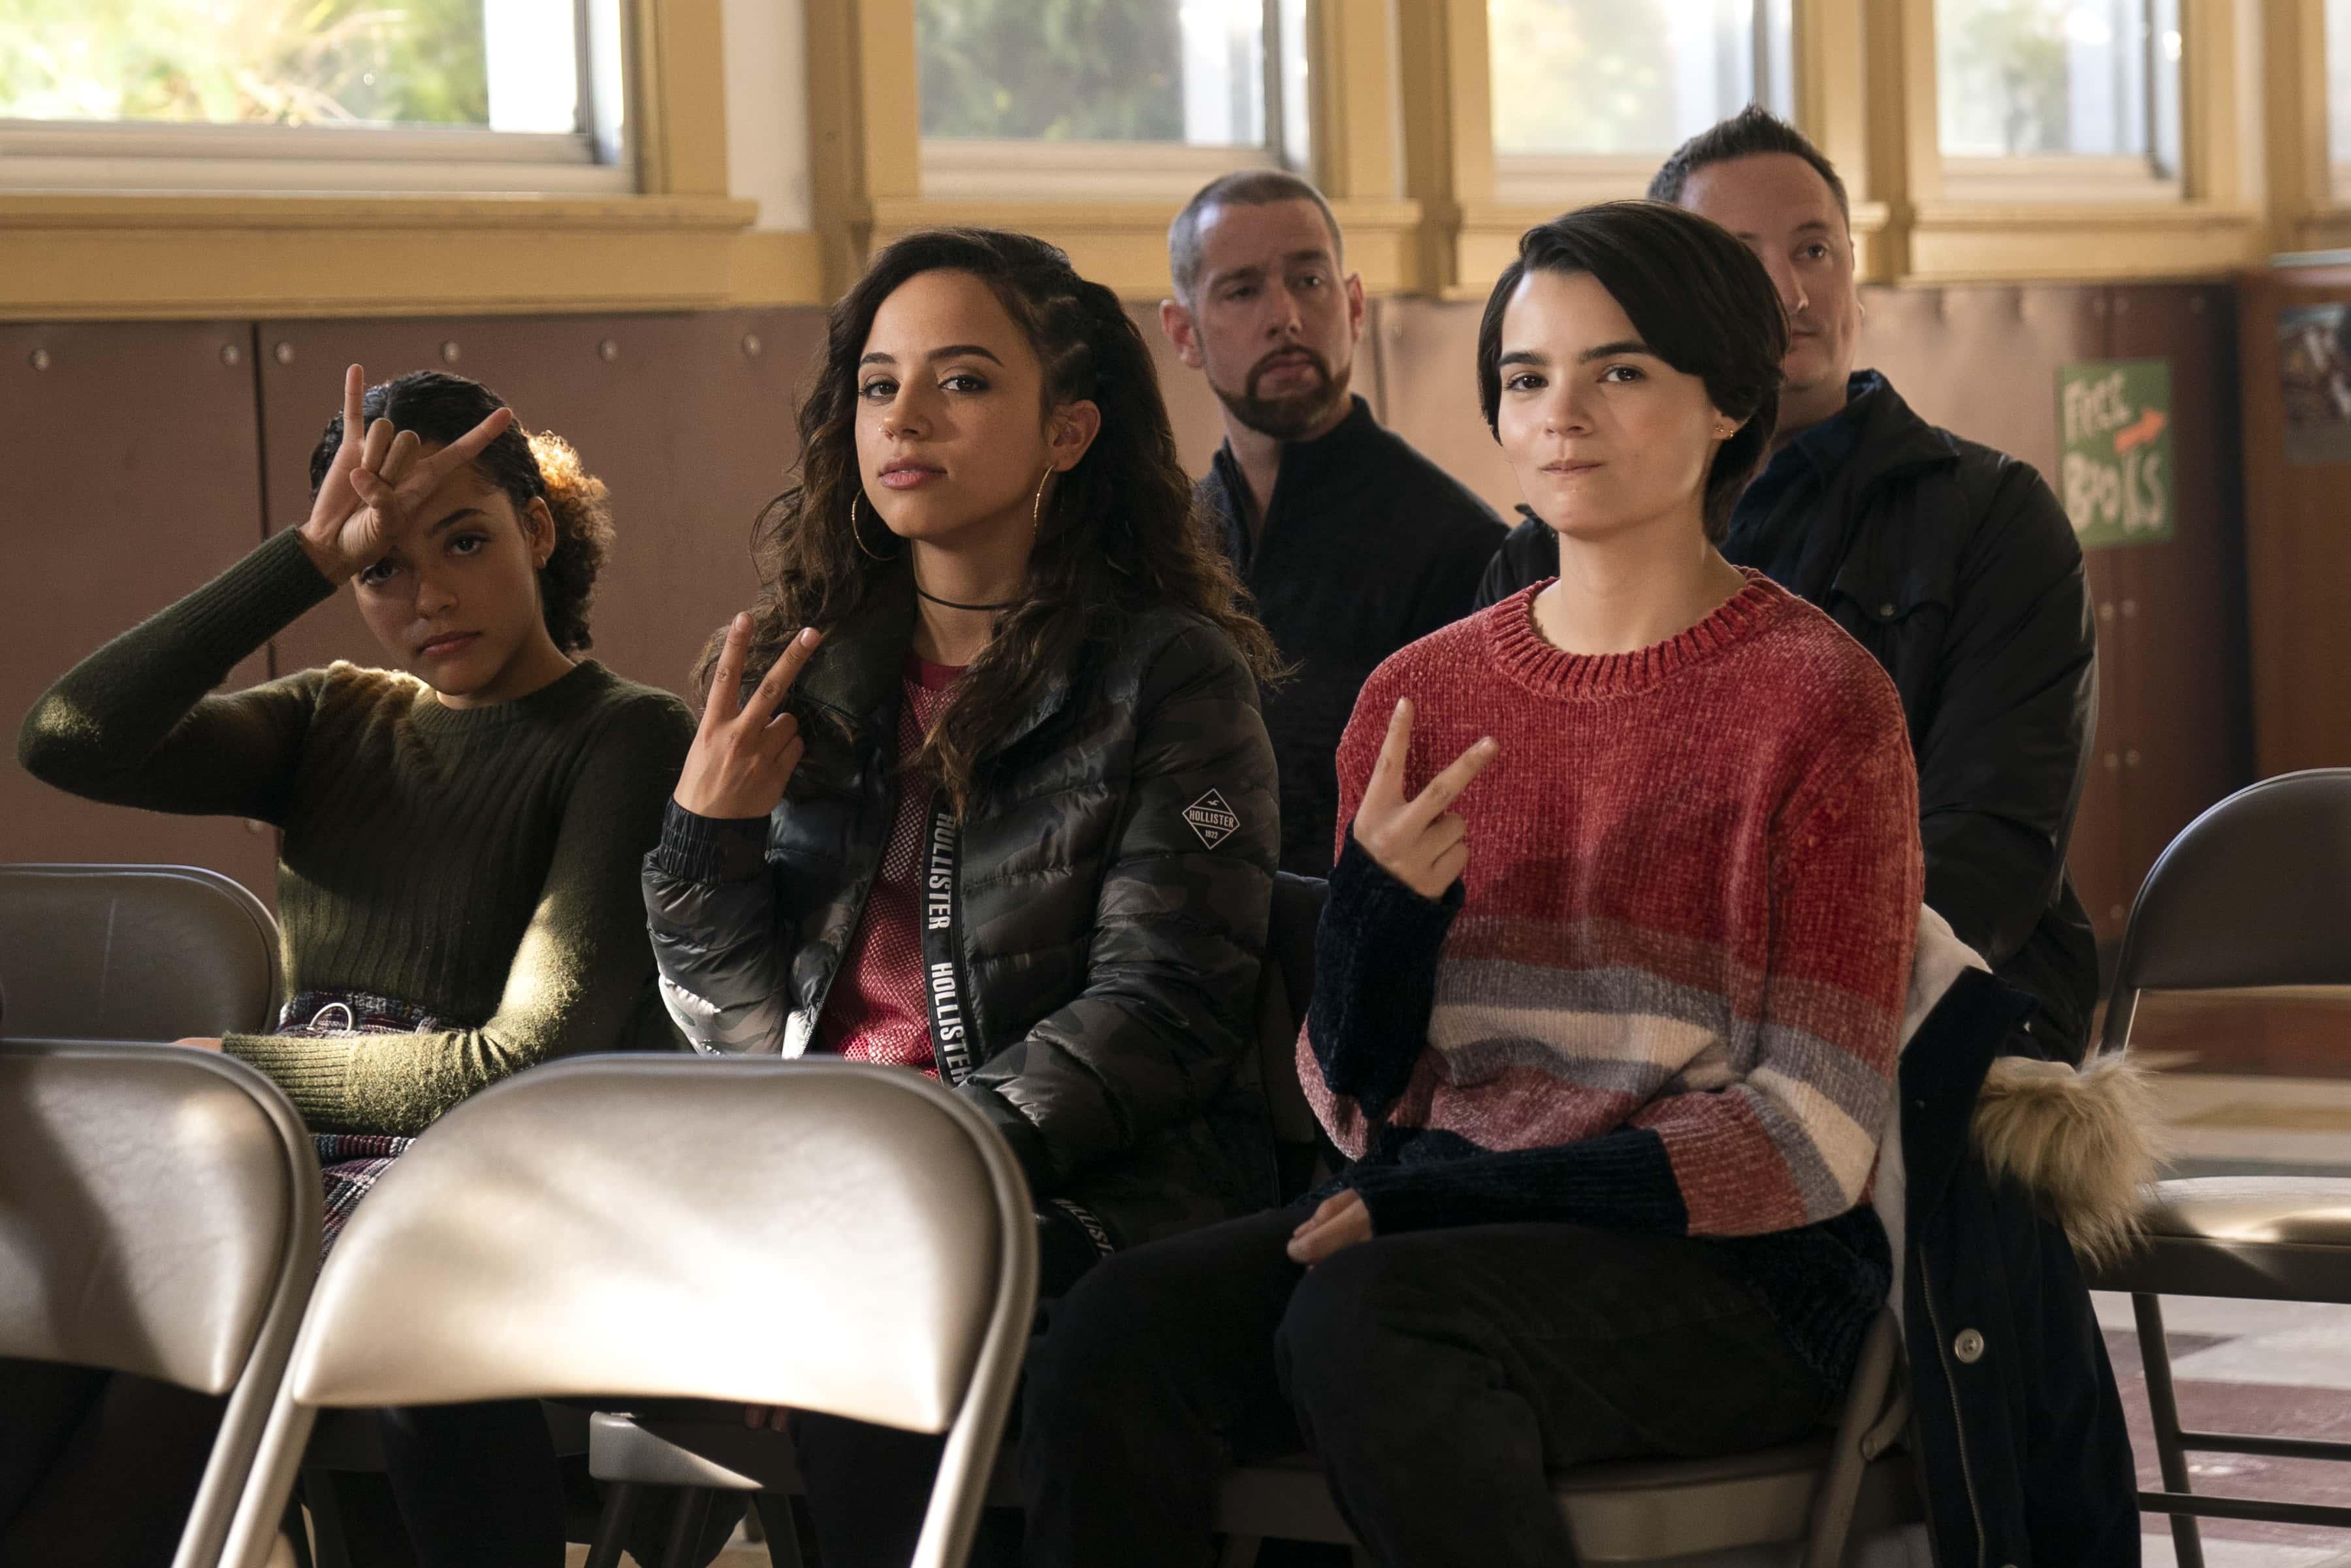 Trinkets' review: Netflix's story of odd friendships amidst